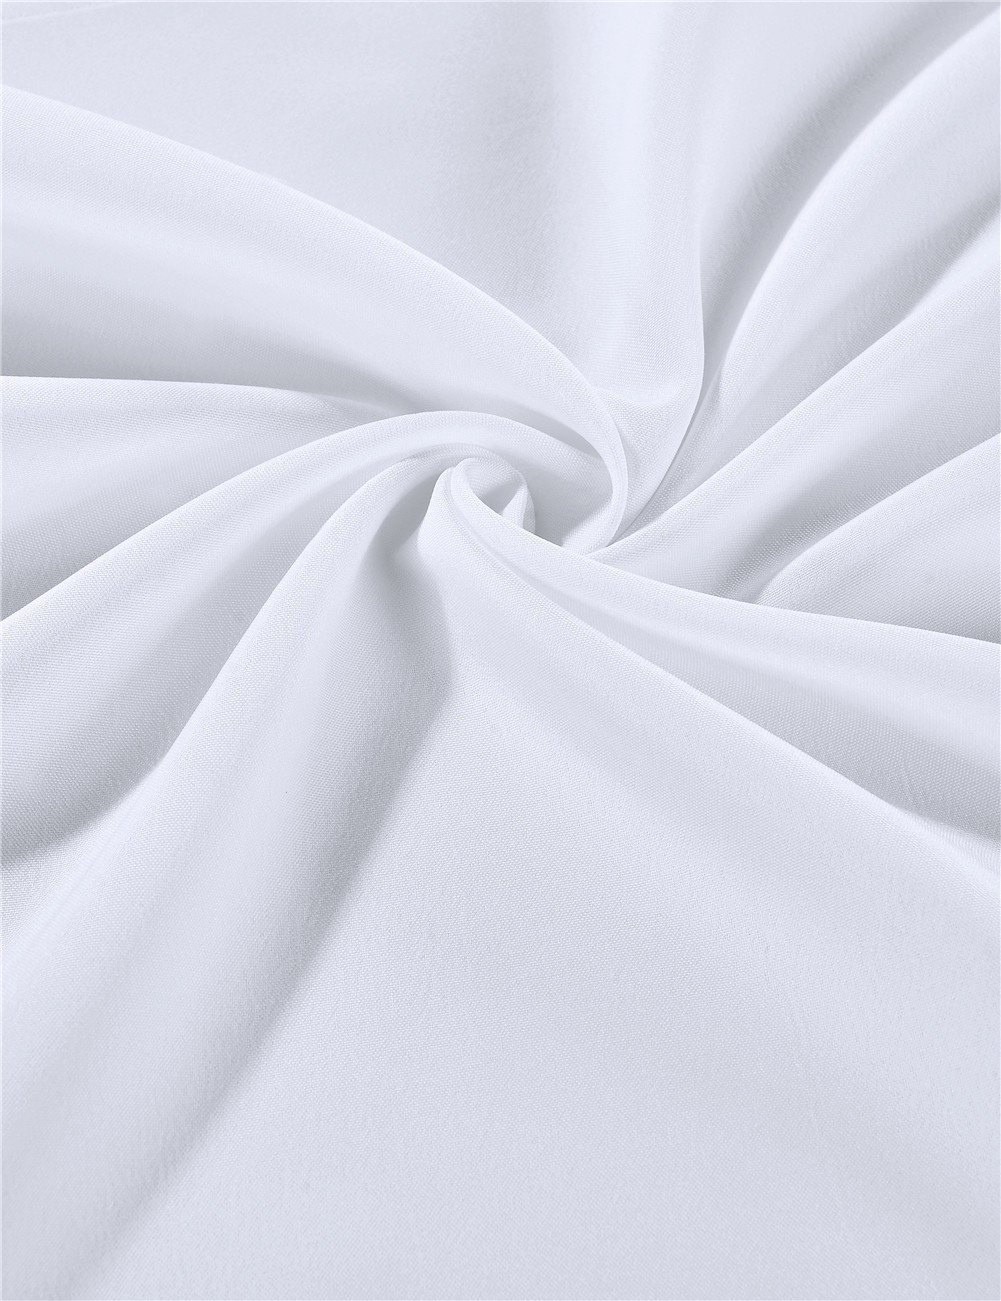 Cieltown Polyester Cloth Napkins 1-Dozen (17 x 17-Inch, white) by cieltown (Image #3)